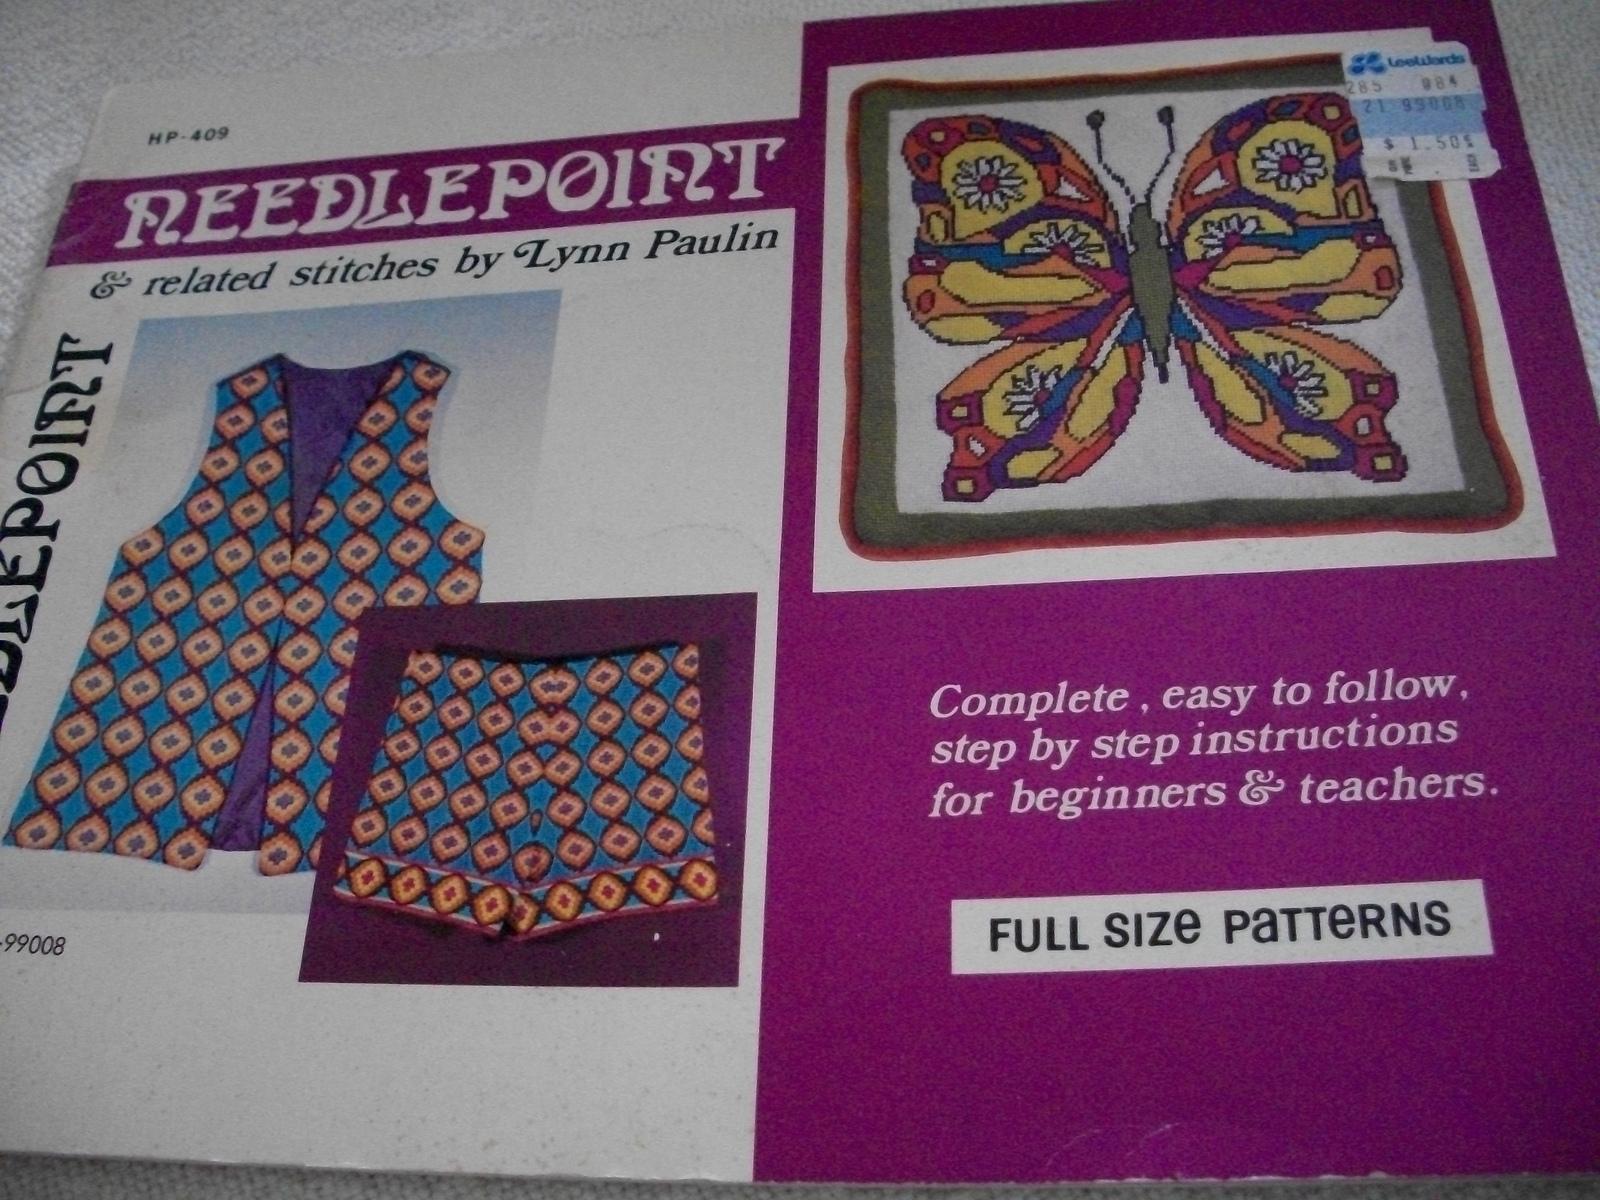 Needlepoint & Related Stitches - $5.00